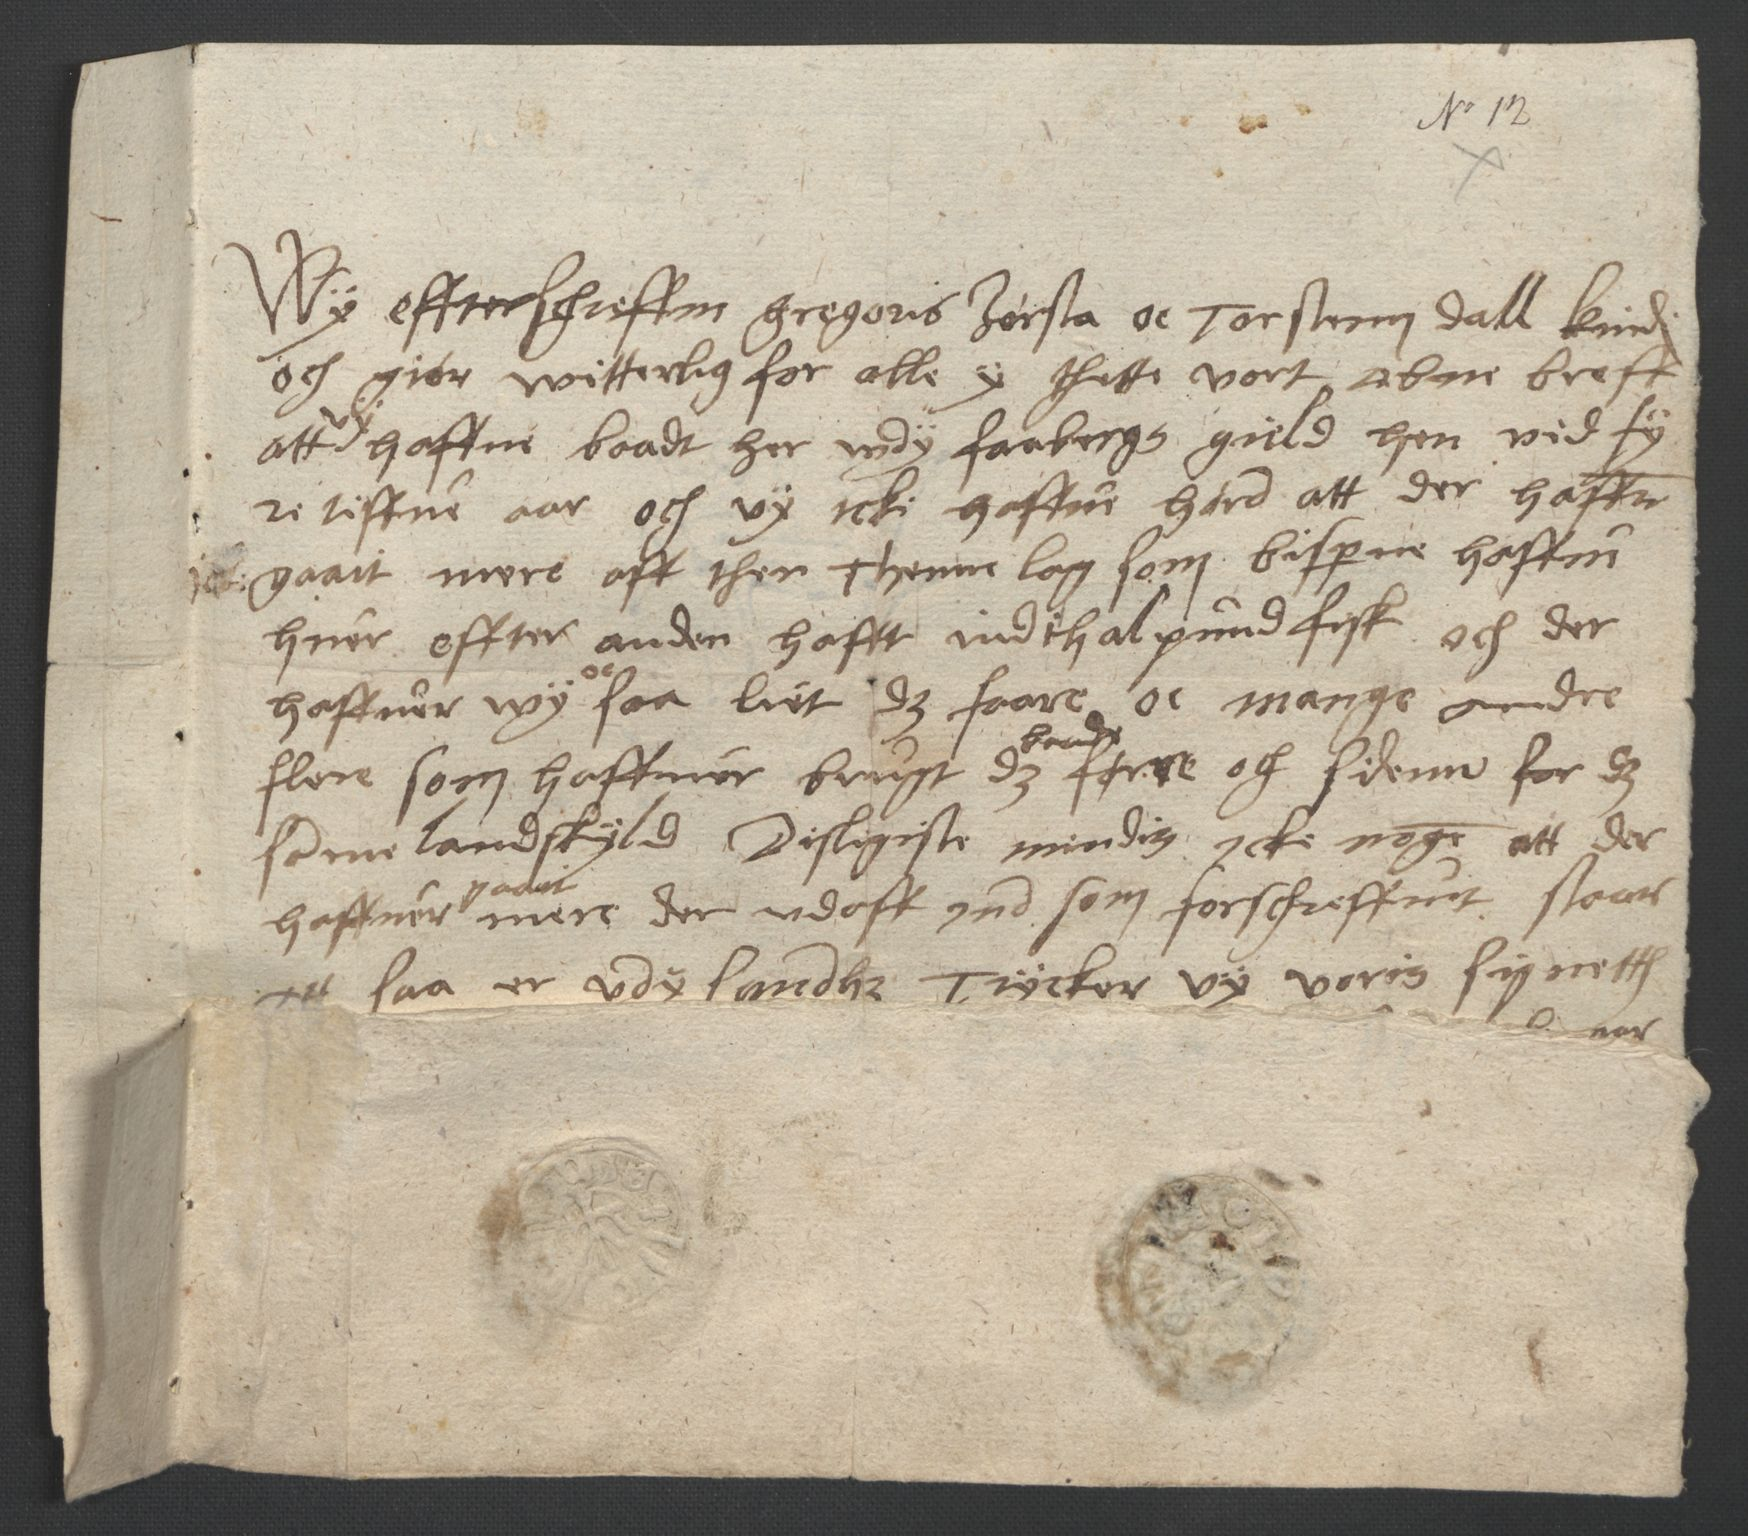 SAO, Oslo stiftsdireksjon, G/Gb/L0001: Bispestolens dokumenter, 1584-1612, s. 12